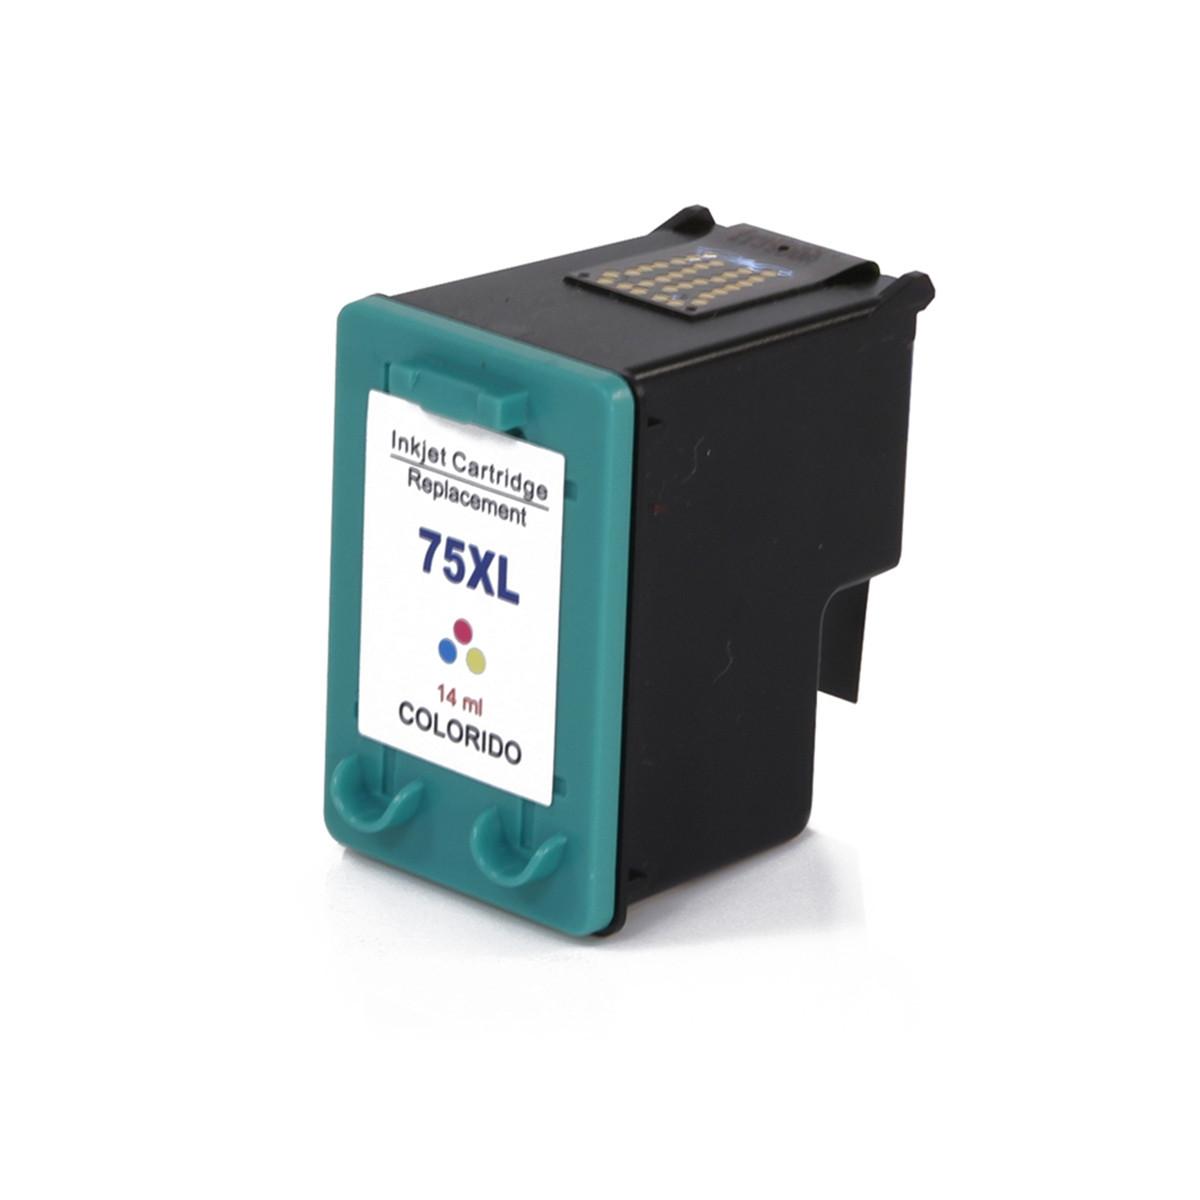 Cartucho de Tinta Compatível HP 75XL CB338WB Colorido | Photosmart C4480 C4280 C5280 | 18ml